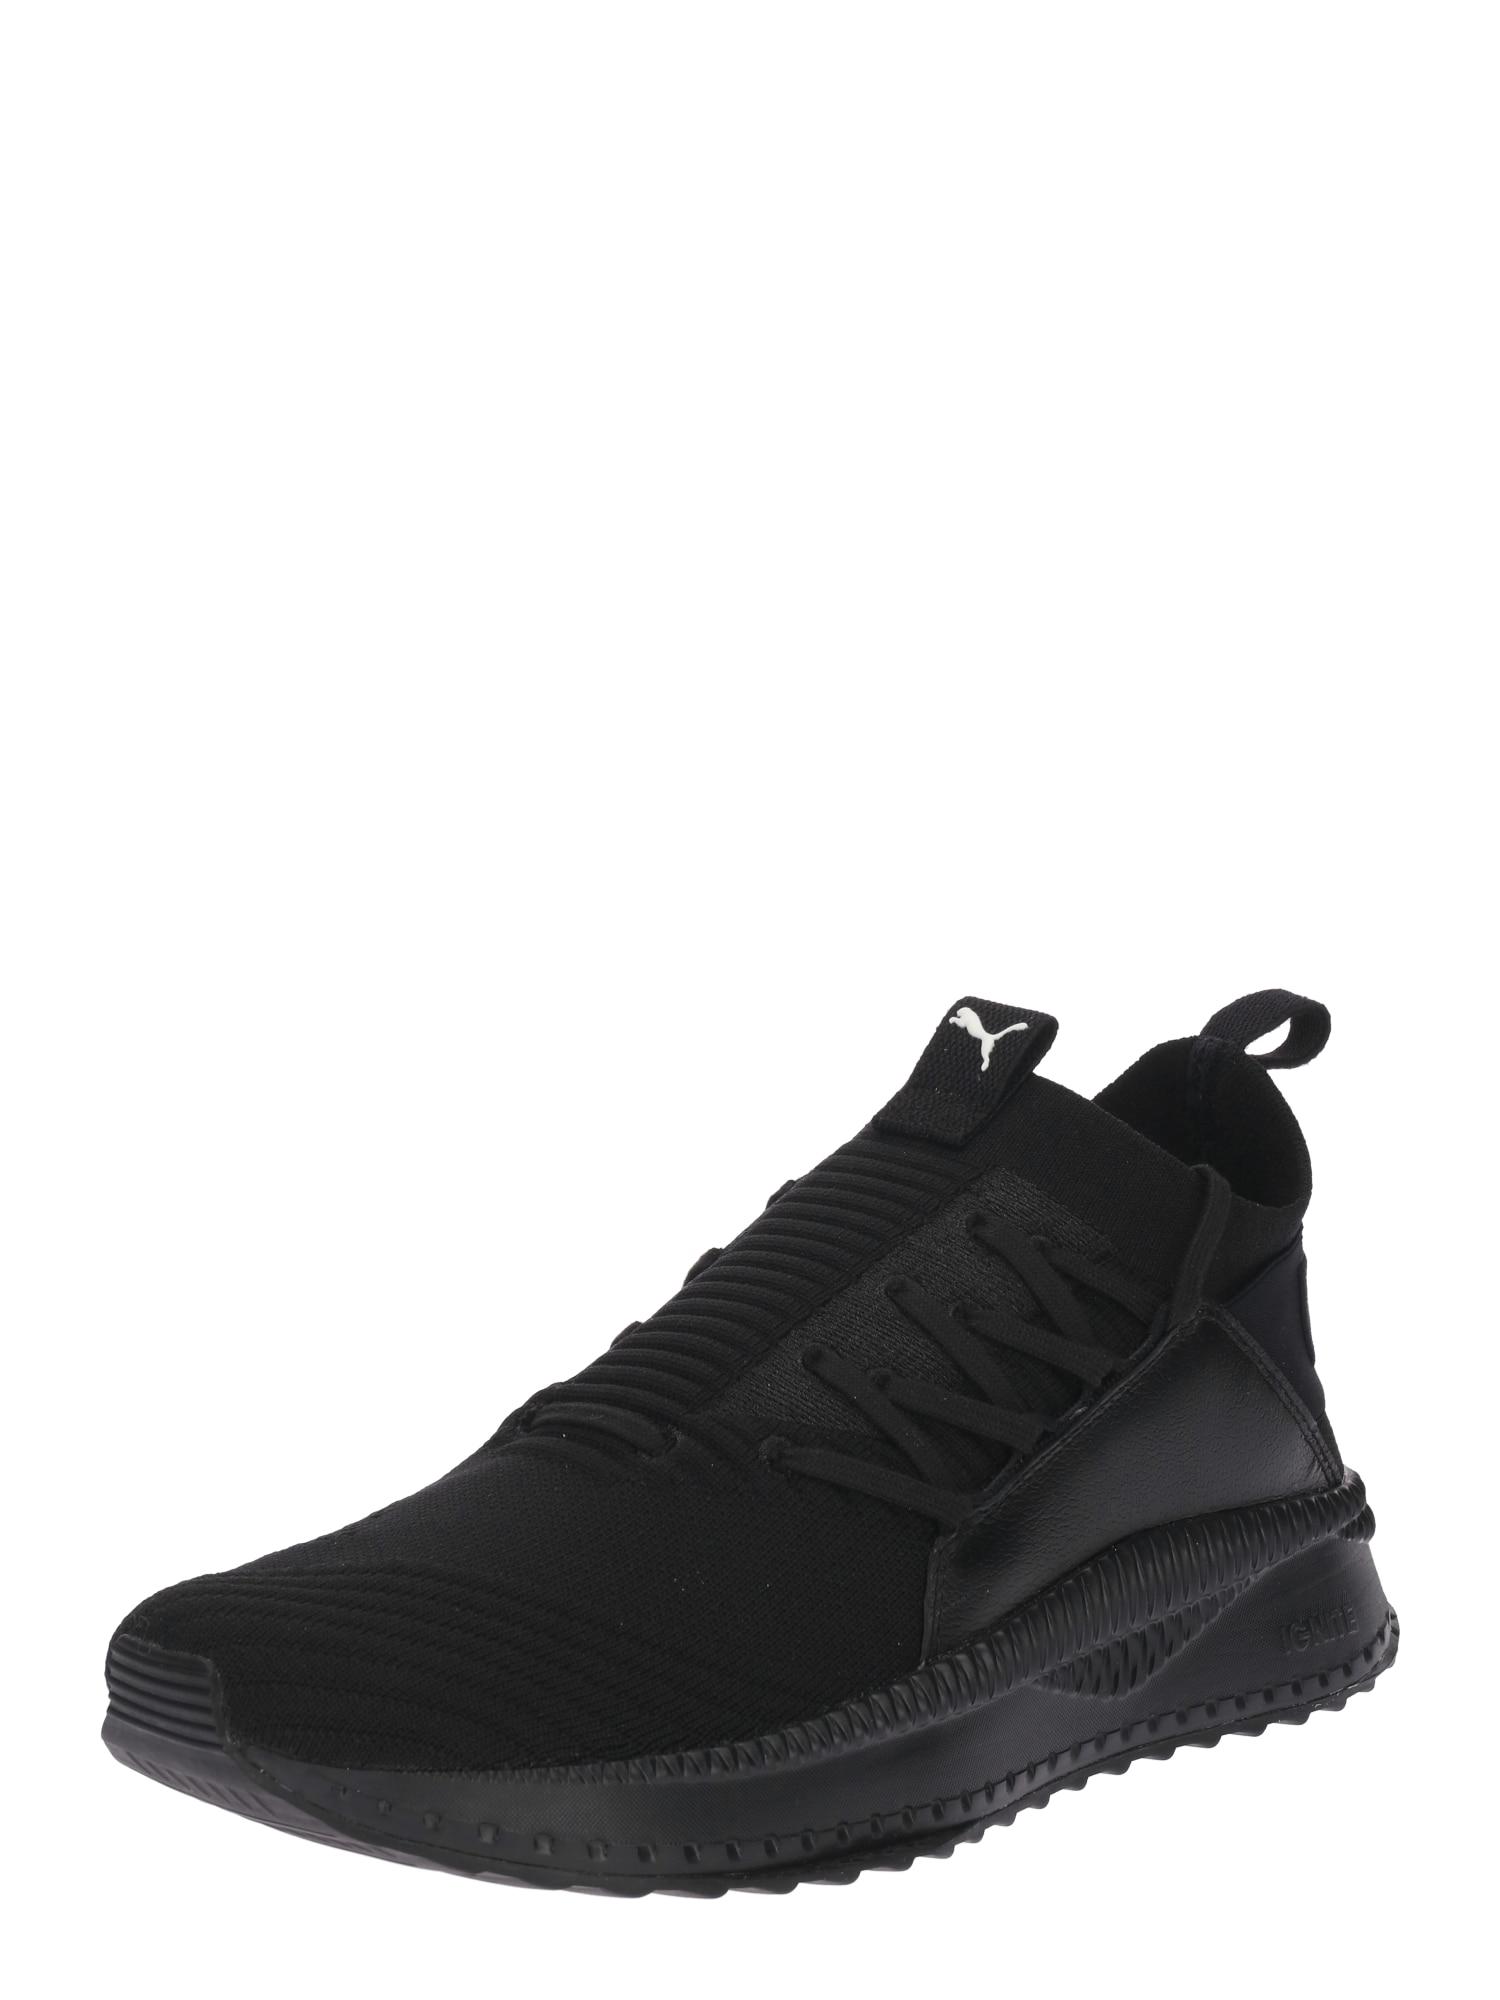 PUMA, Dames Sneakers laag 'TSUGI Jun', zwart